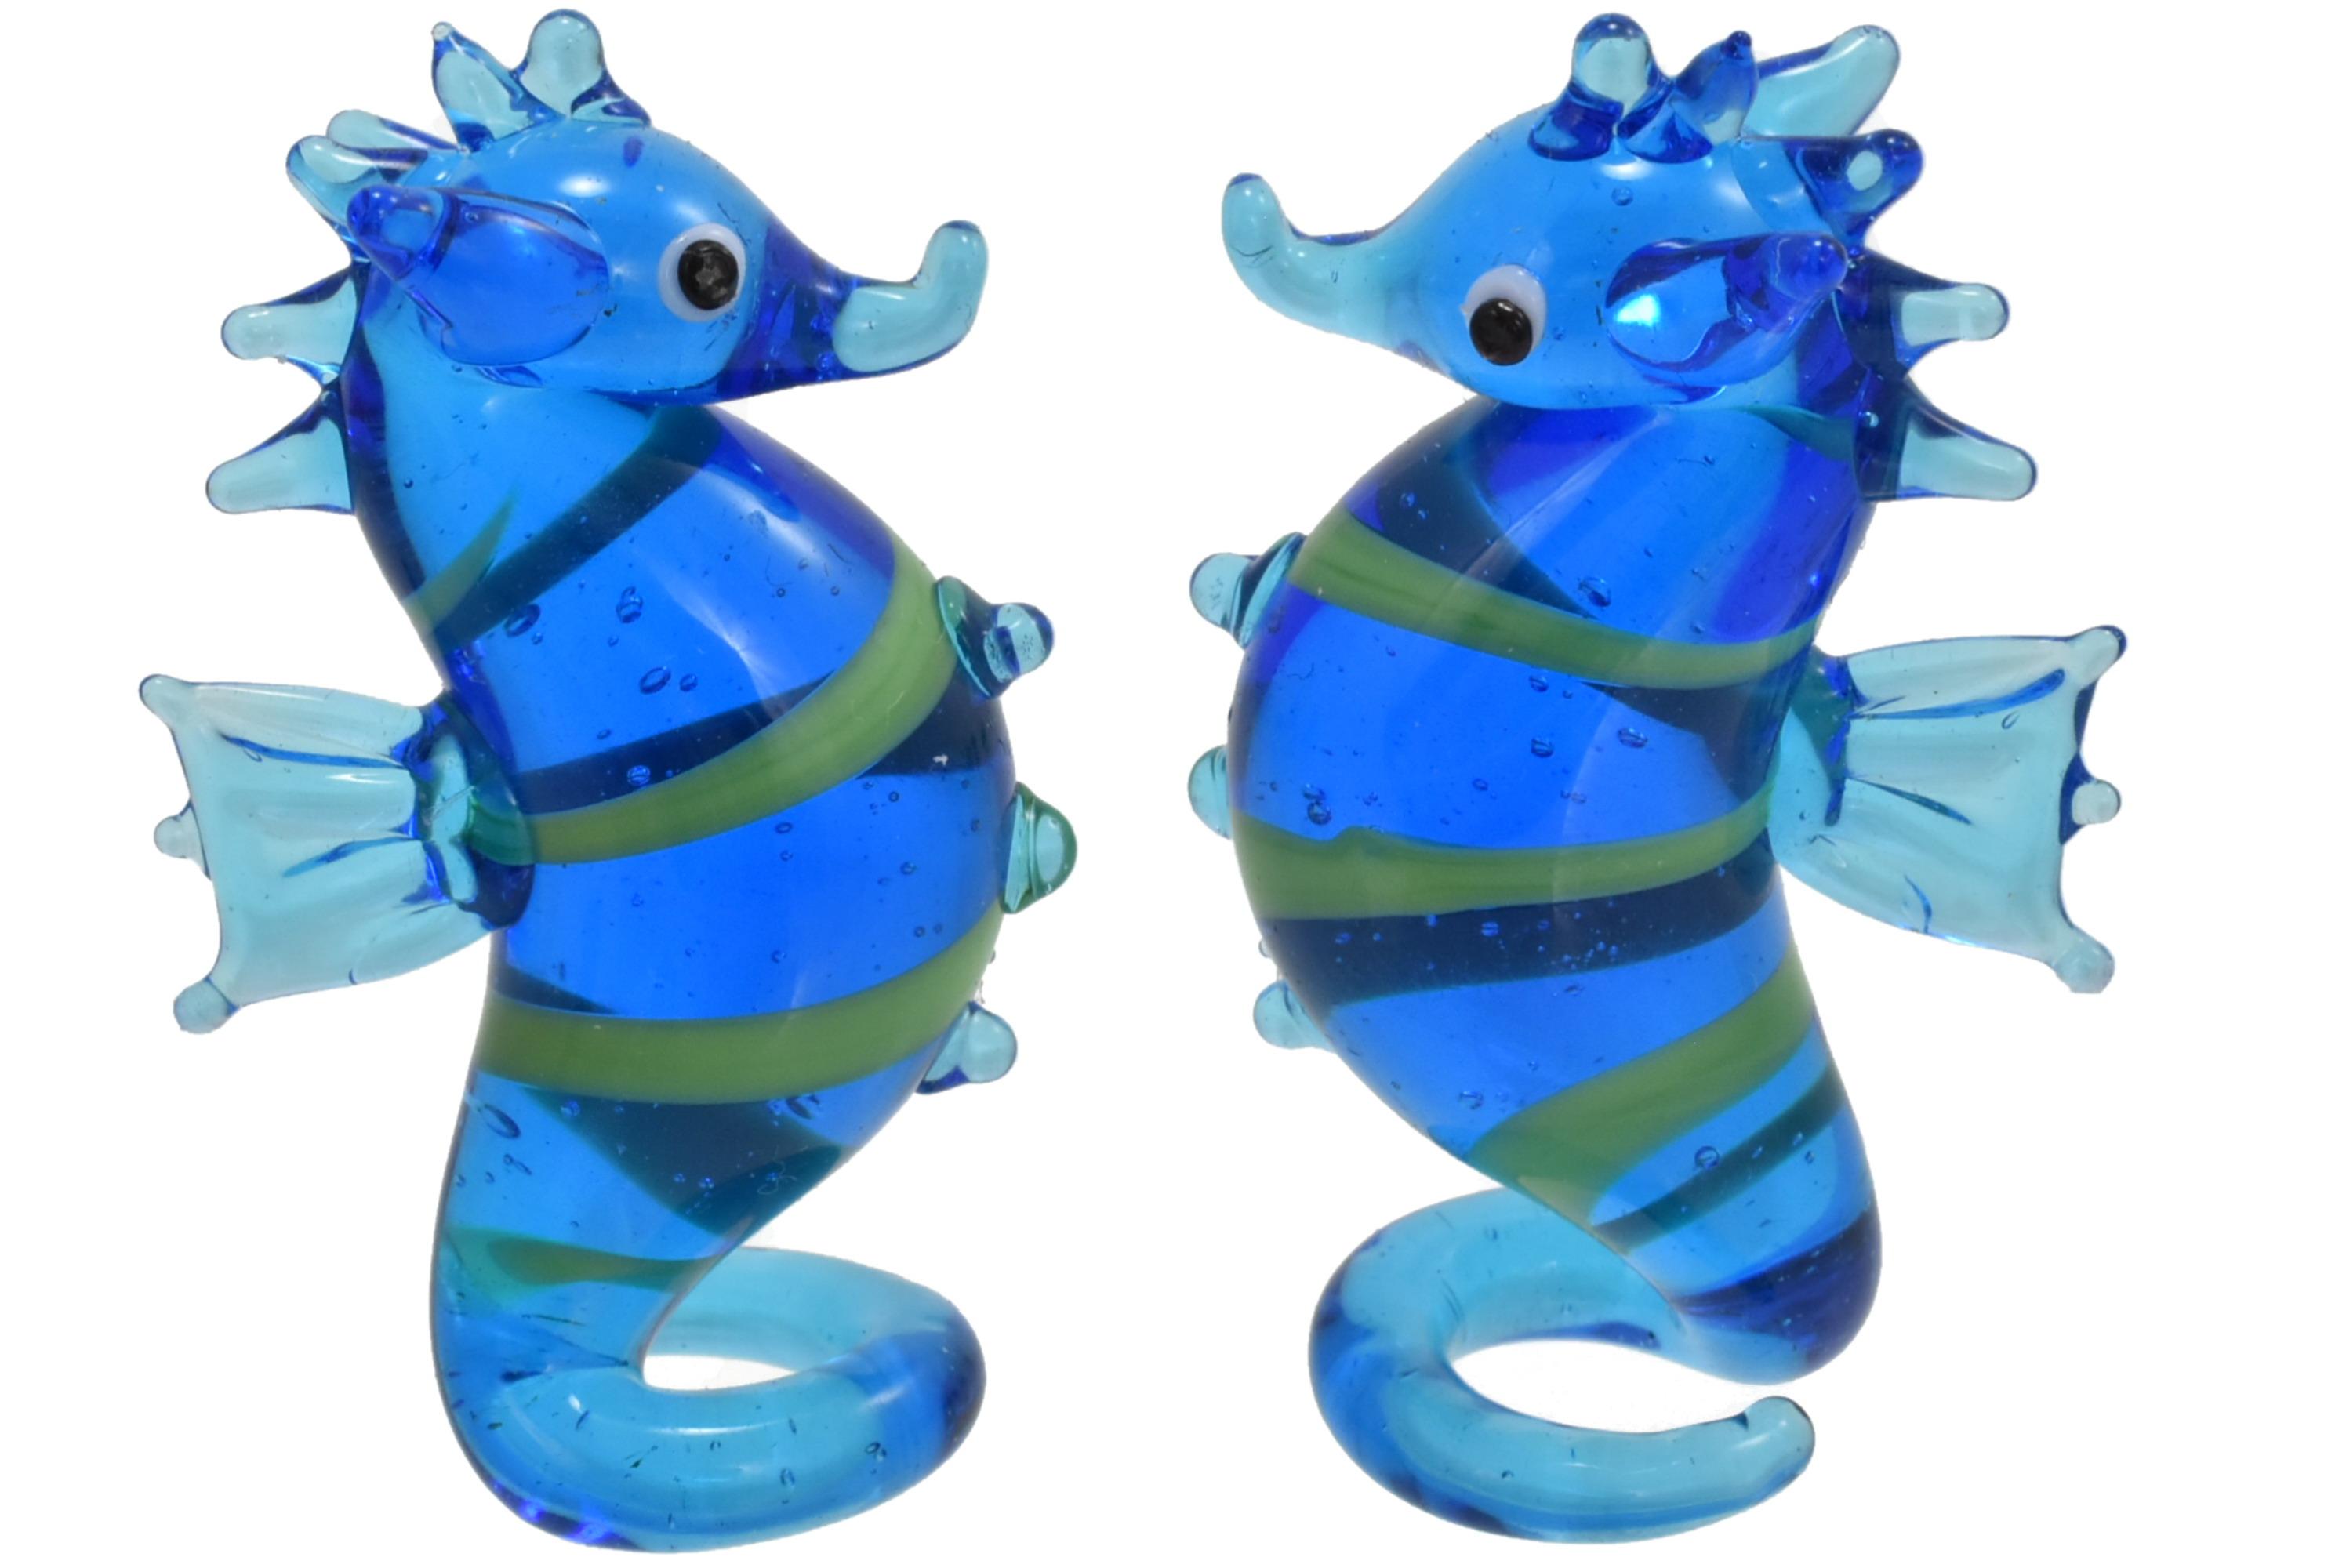 5cm Glass Seahorse Ornament